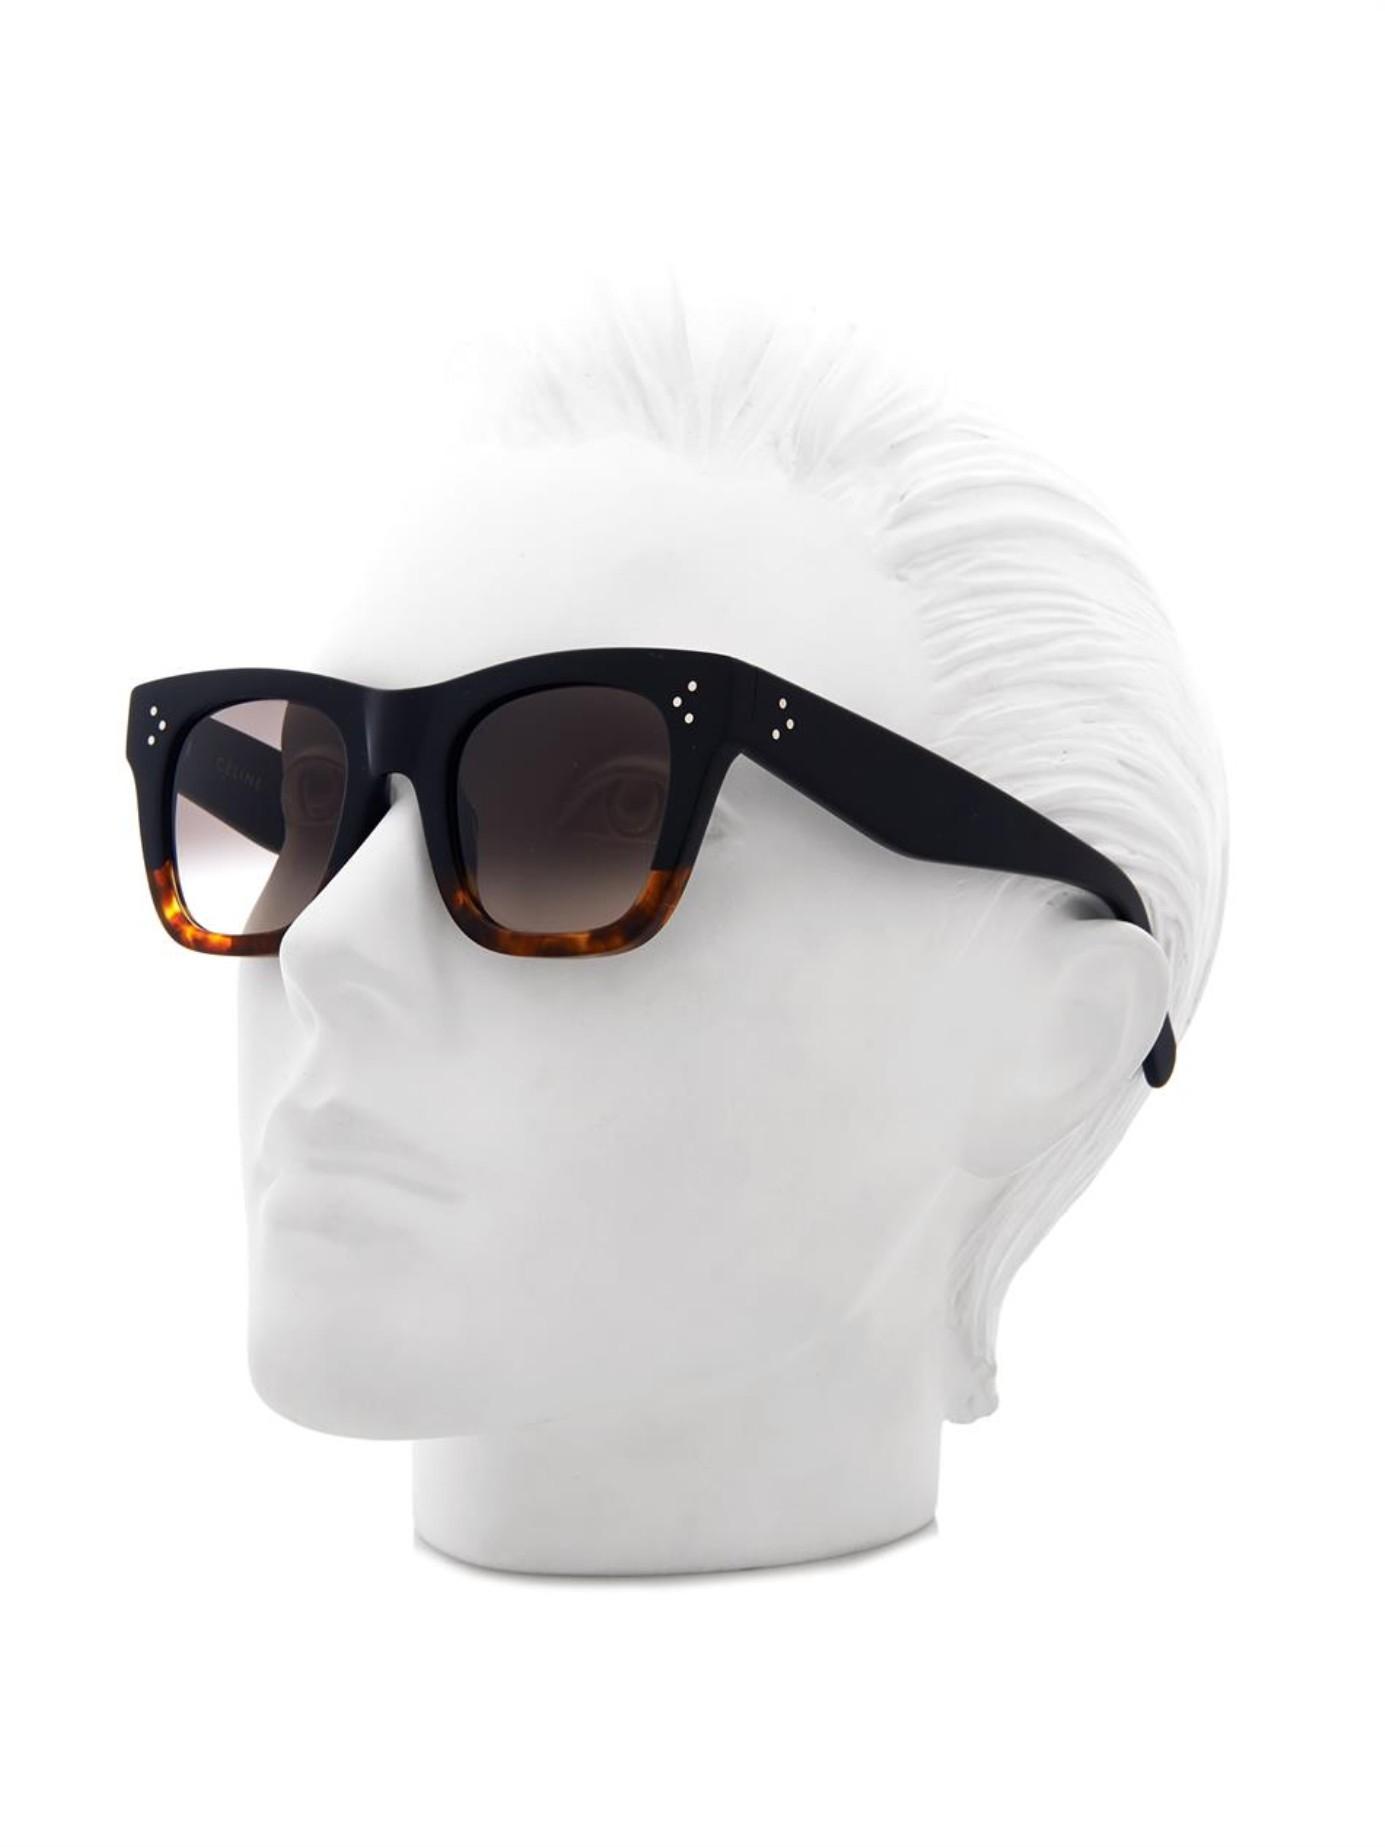 5415dae633a94 Black Celine Square Glasses